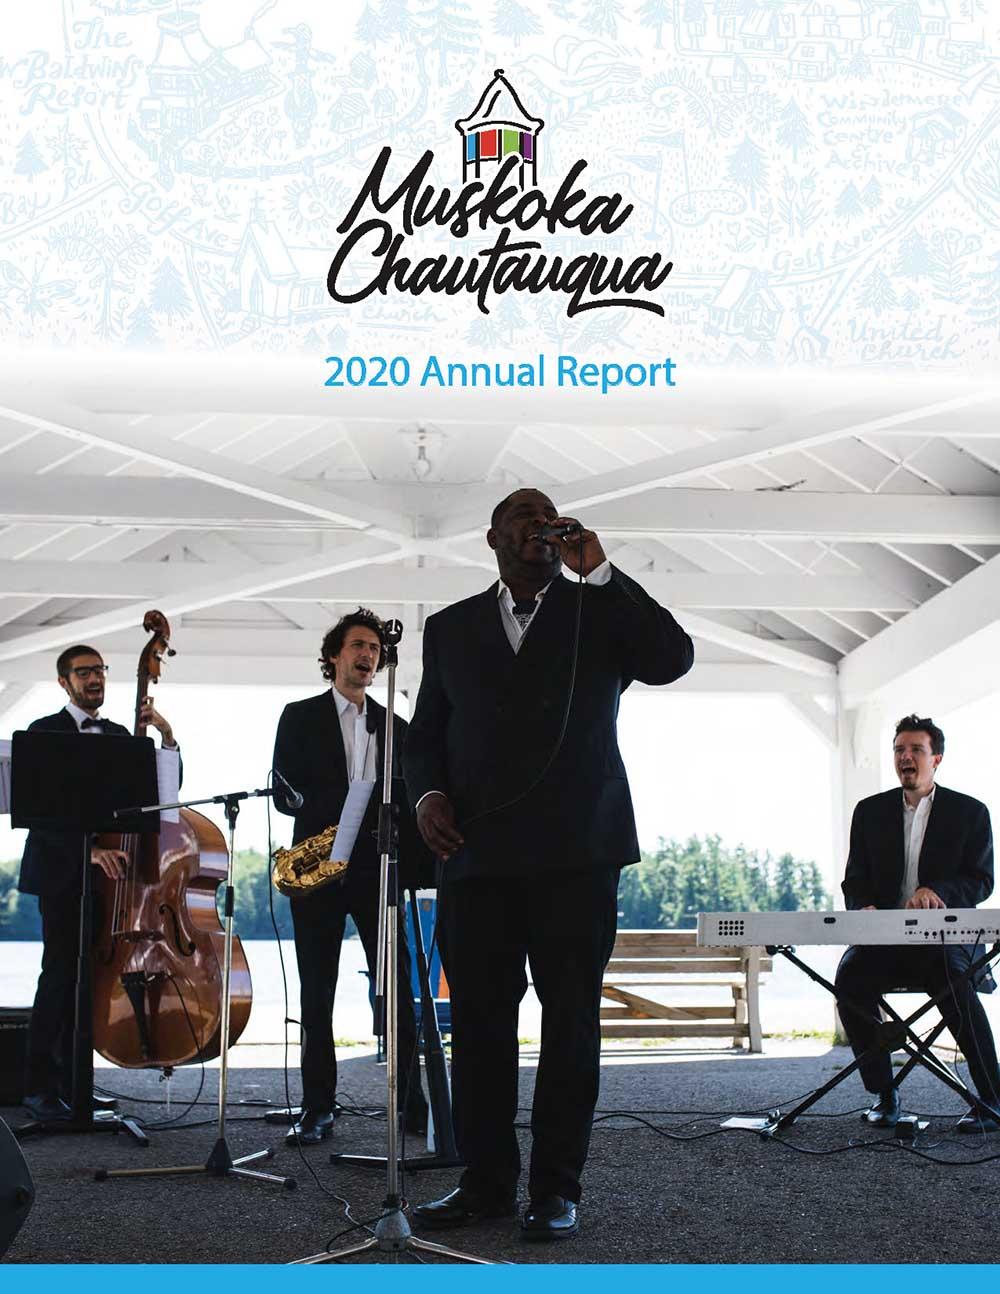 Muskoka Chautauqua Annual Report 2020